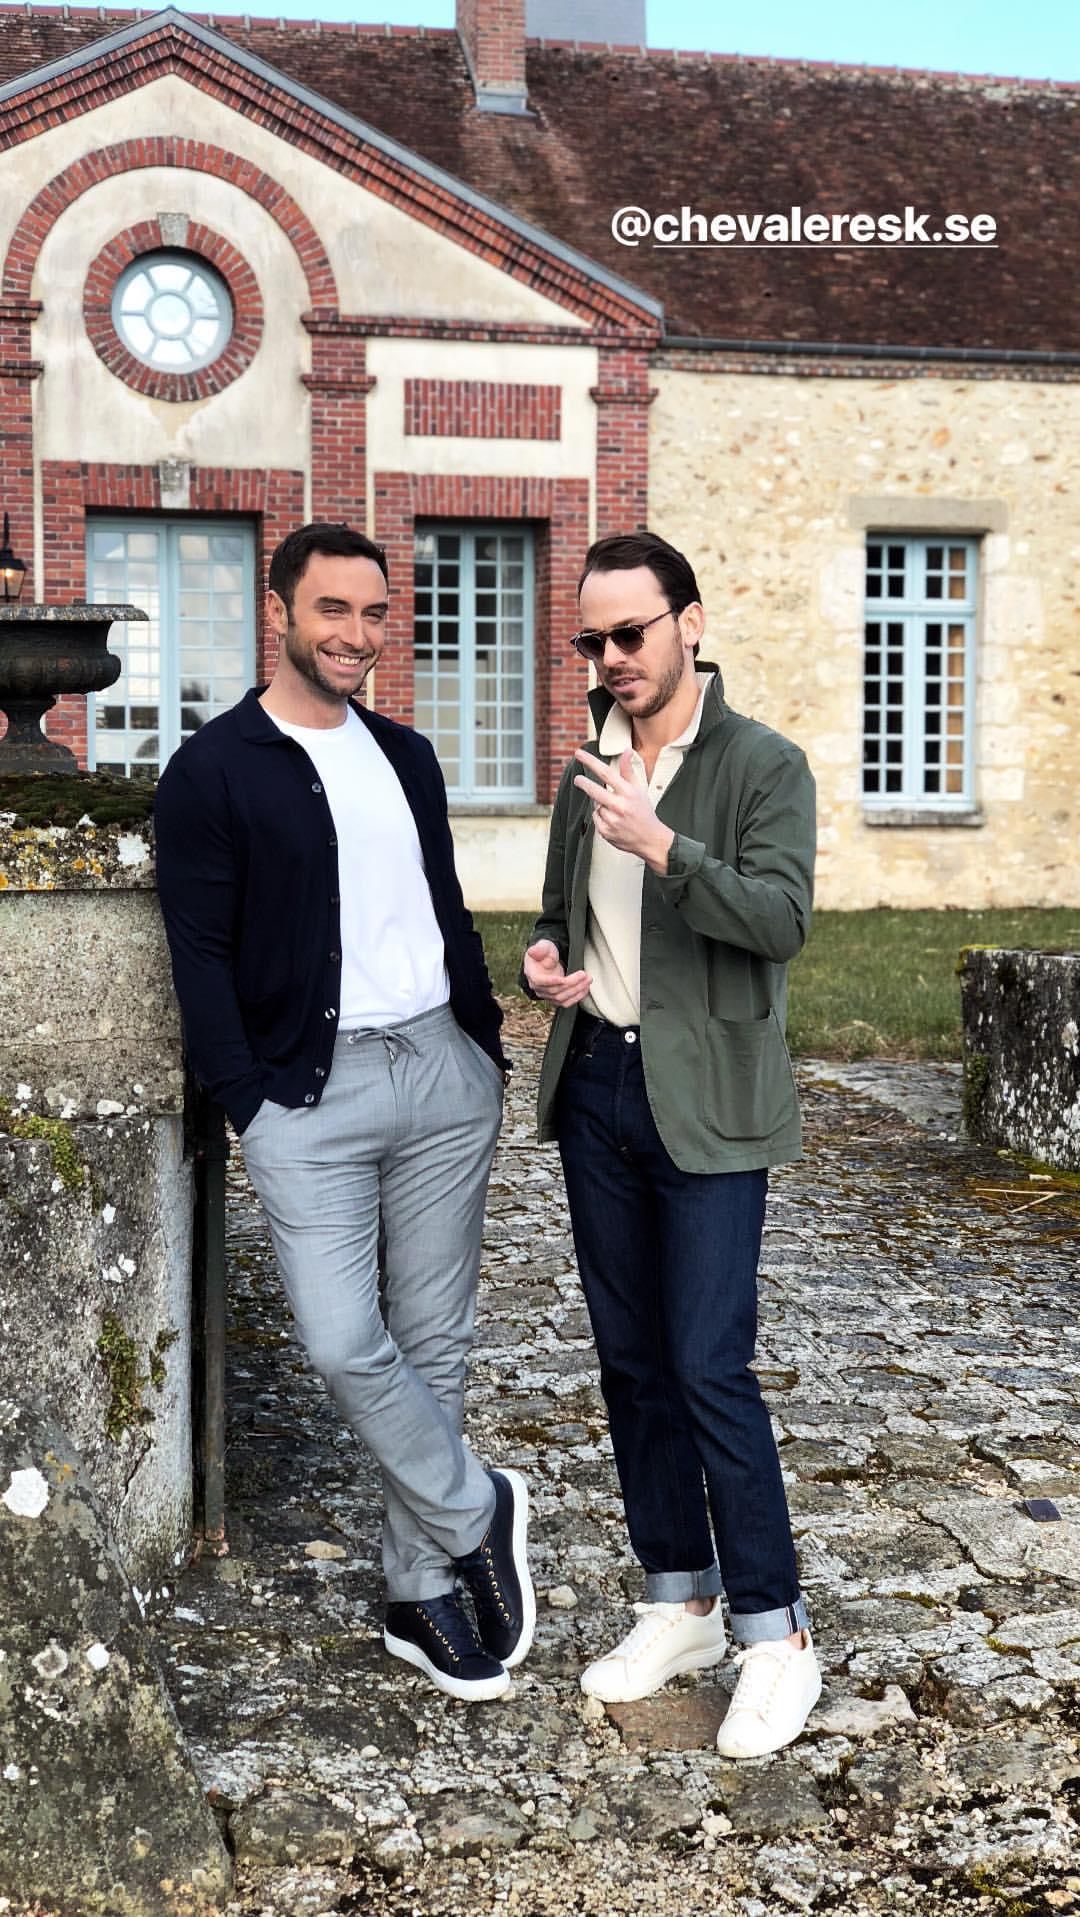 «Bienvenue» in France to all the Chevaleresk Team